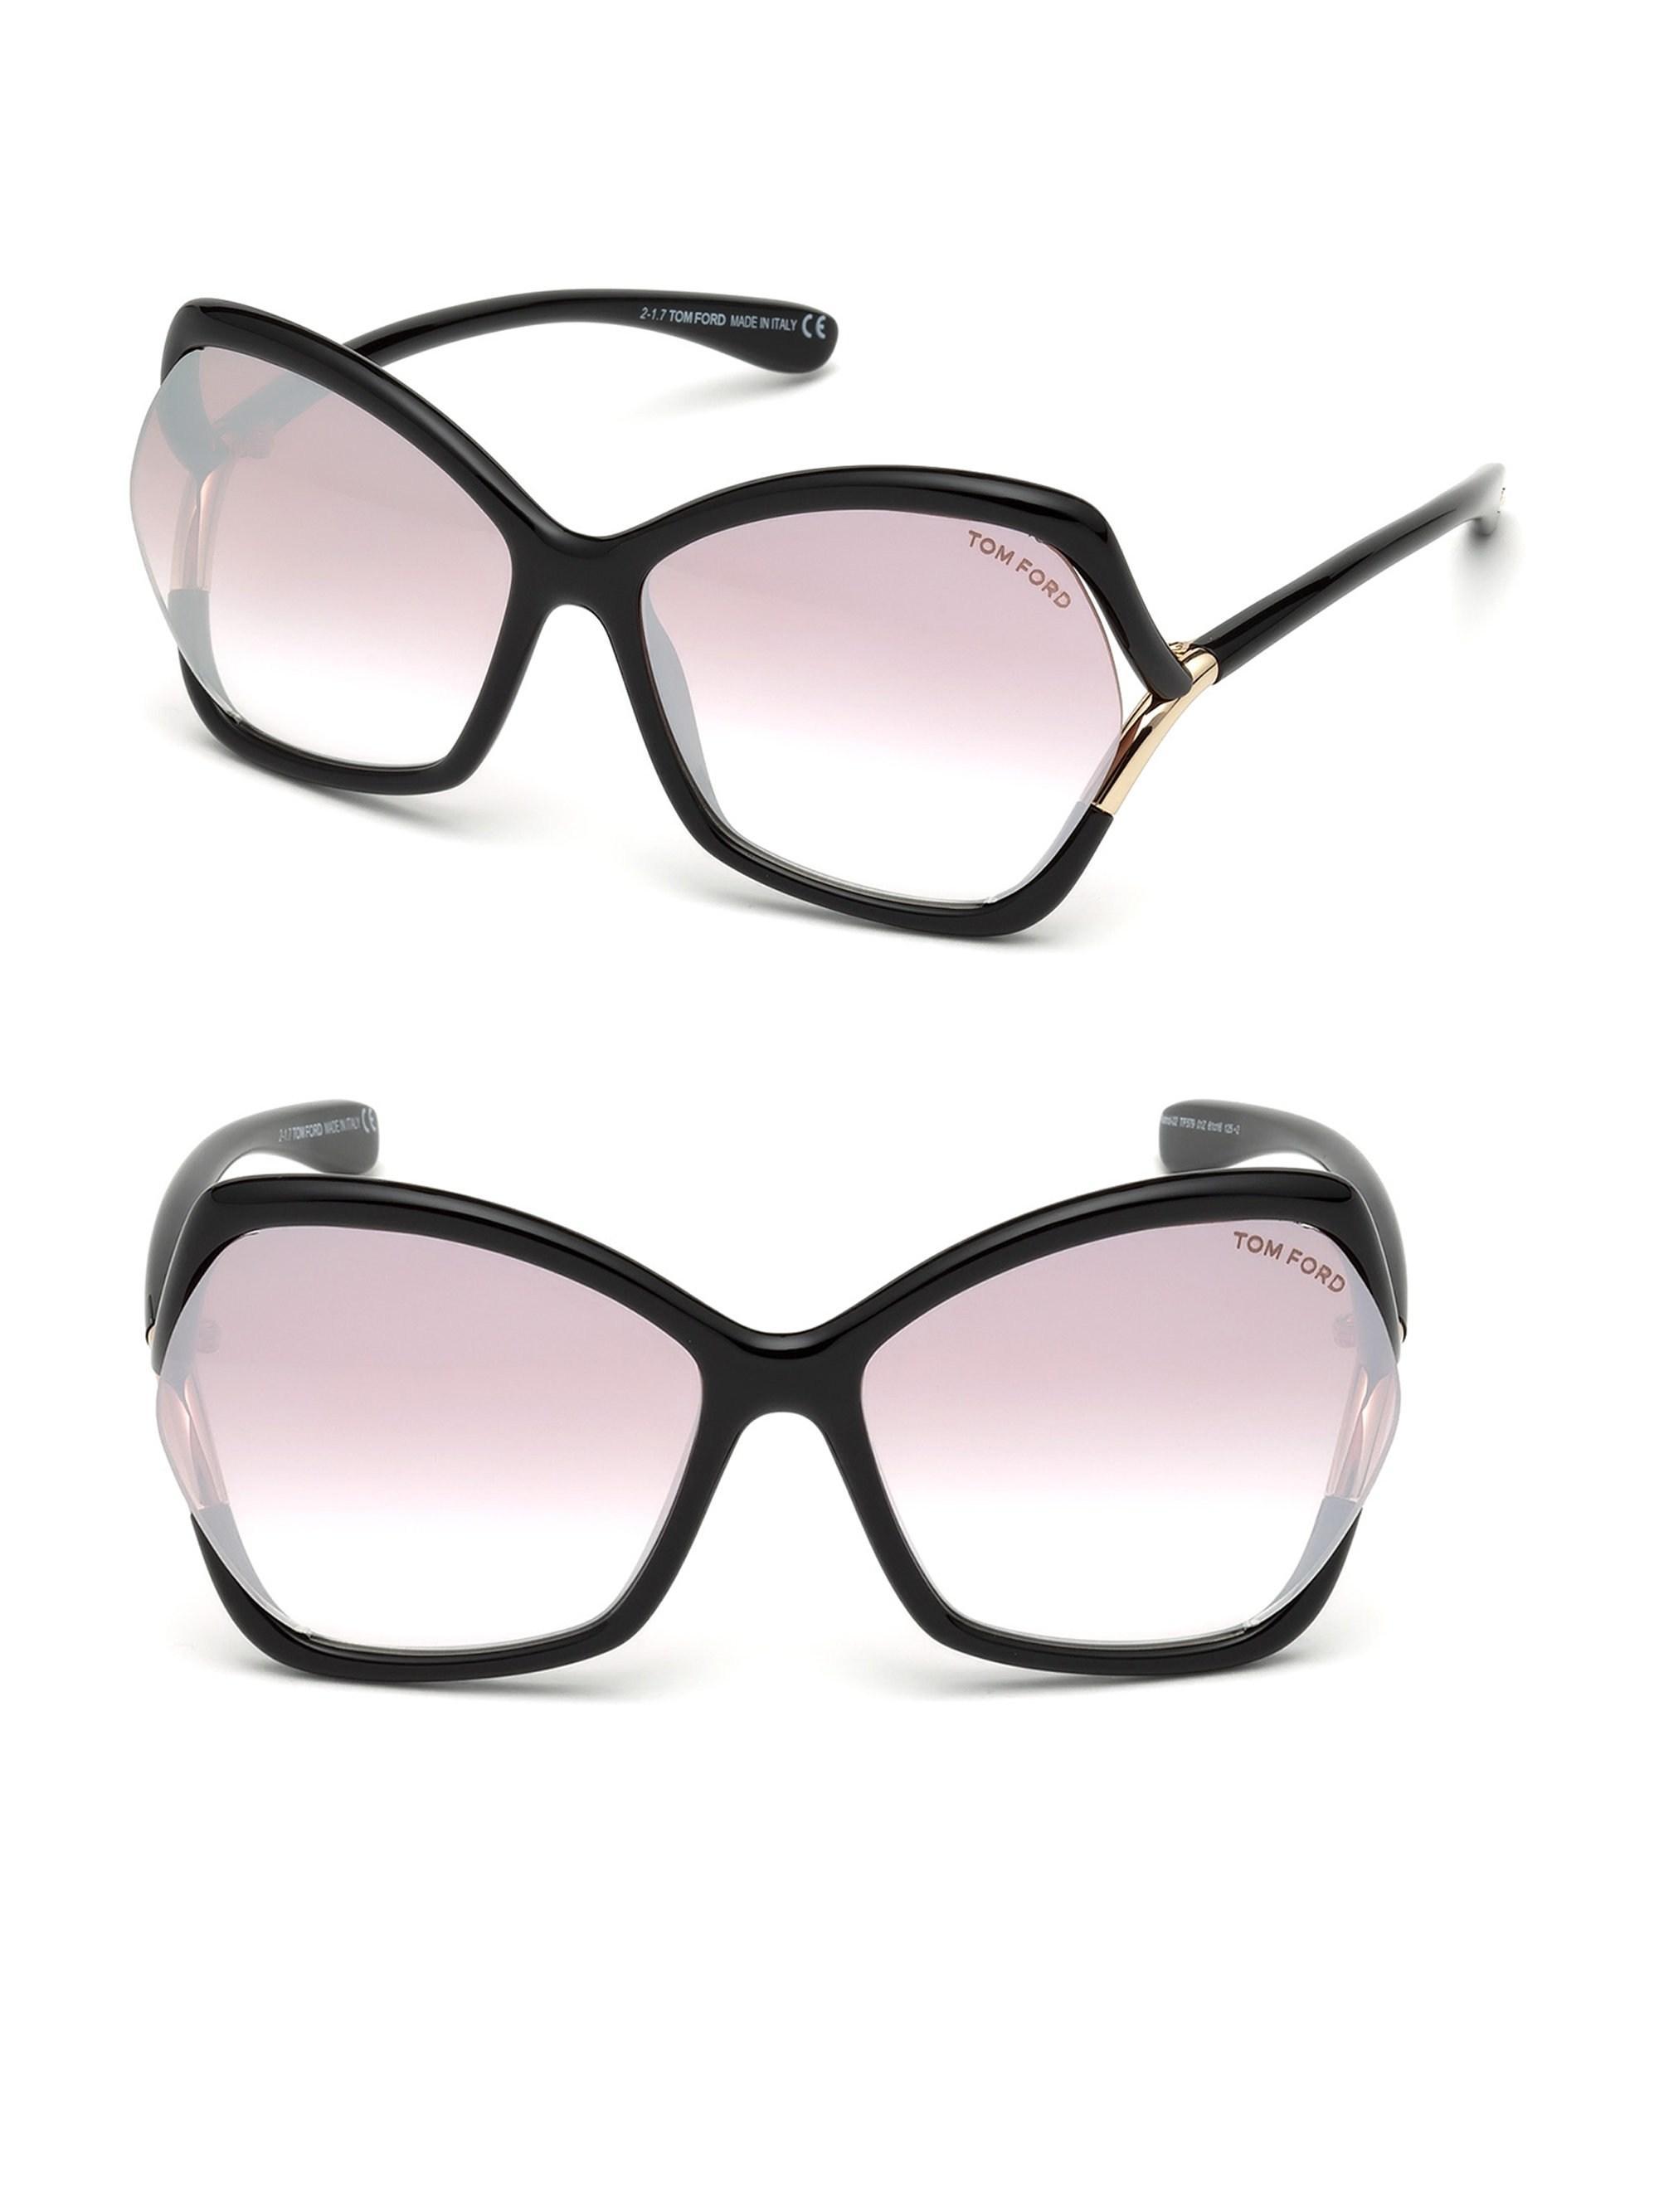 024f21f73d8b Lyst - Tom Ford Women s 61mm Astrid Oversized Pink Lens Sunglasses ...